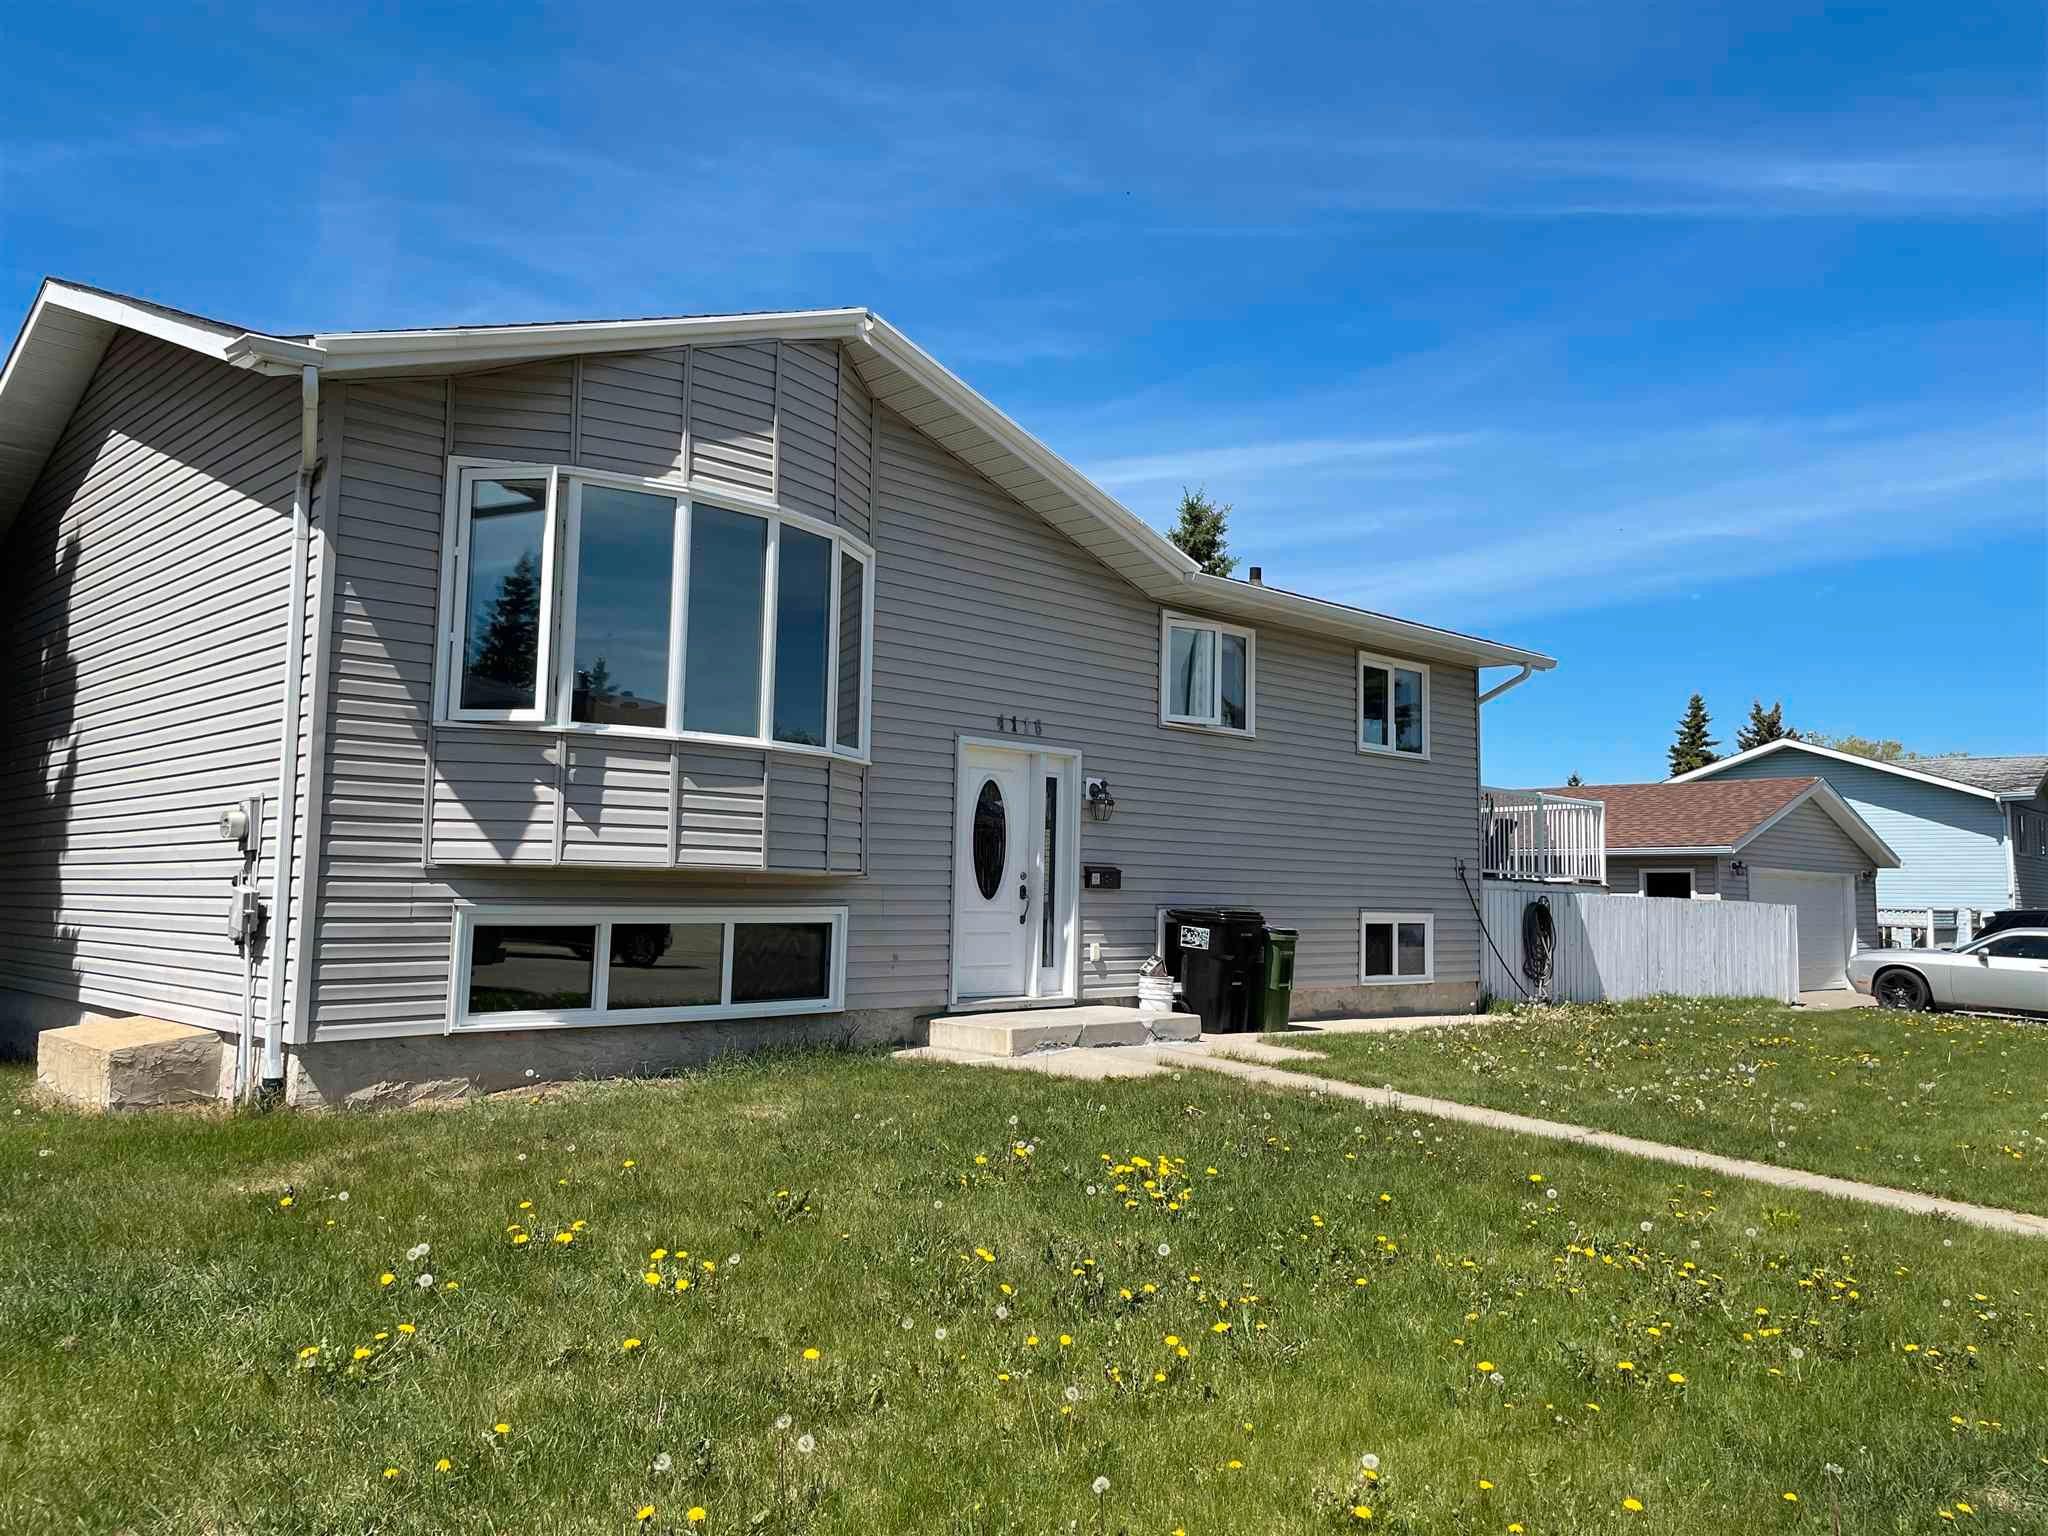 Main Photo: 4116 18 Avenue in Edmonton: Zone 29 House for sale : MLS®# E4247862